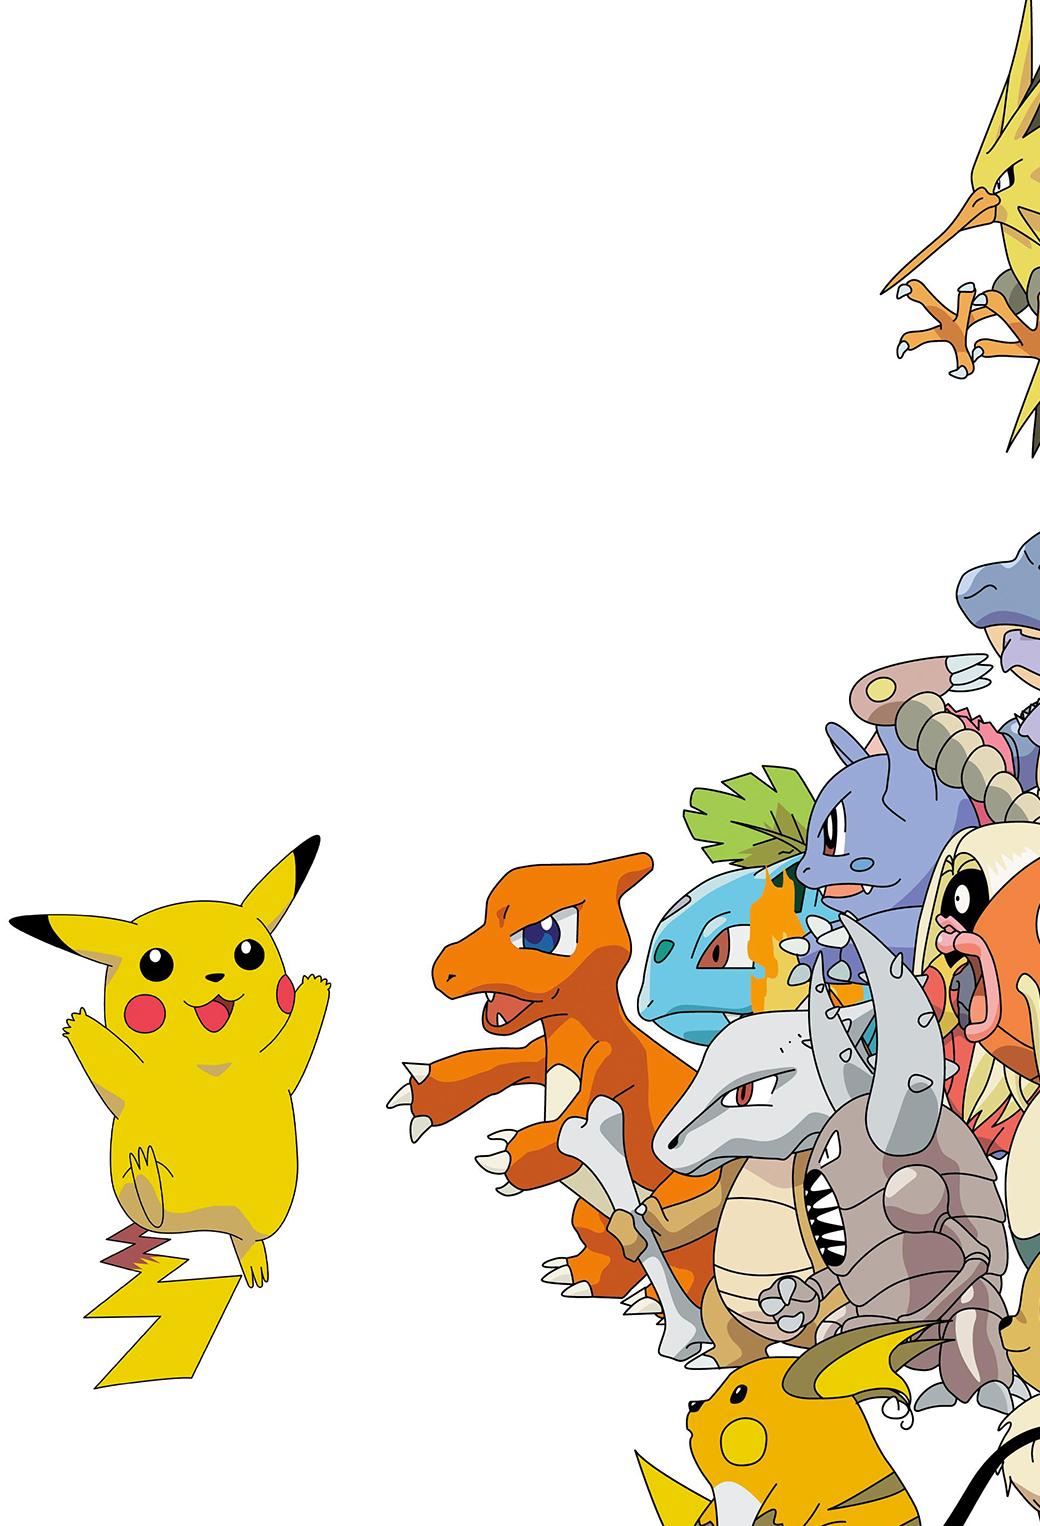 Pokemon Pikachu   iPhone Parallax Wallpaper for iPhone X 8 7 6 1040x1526